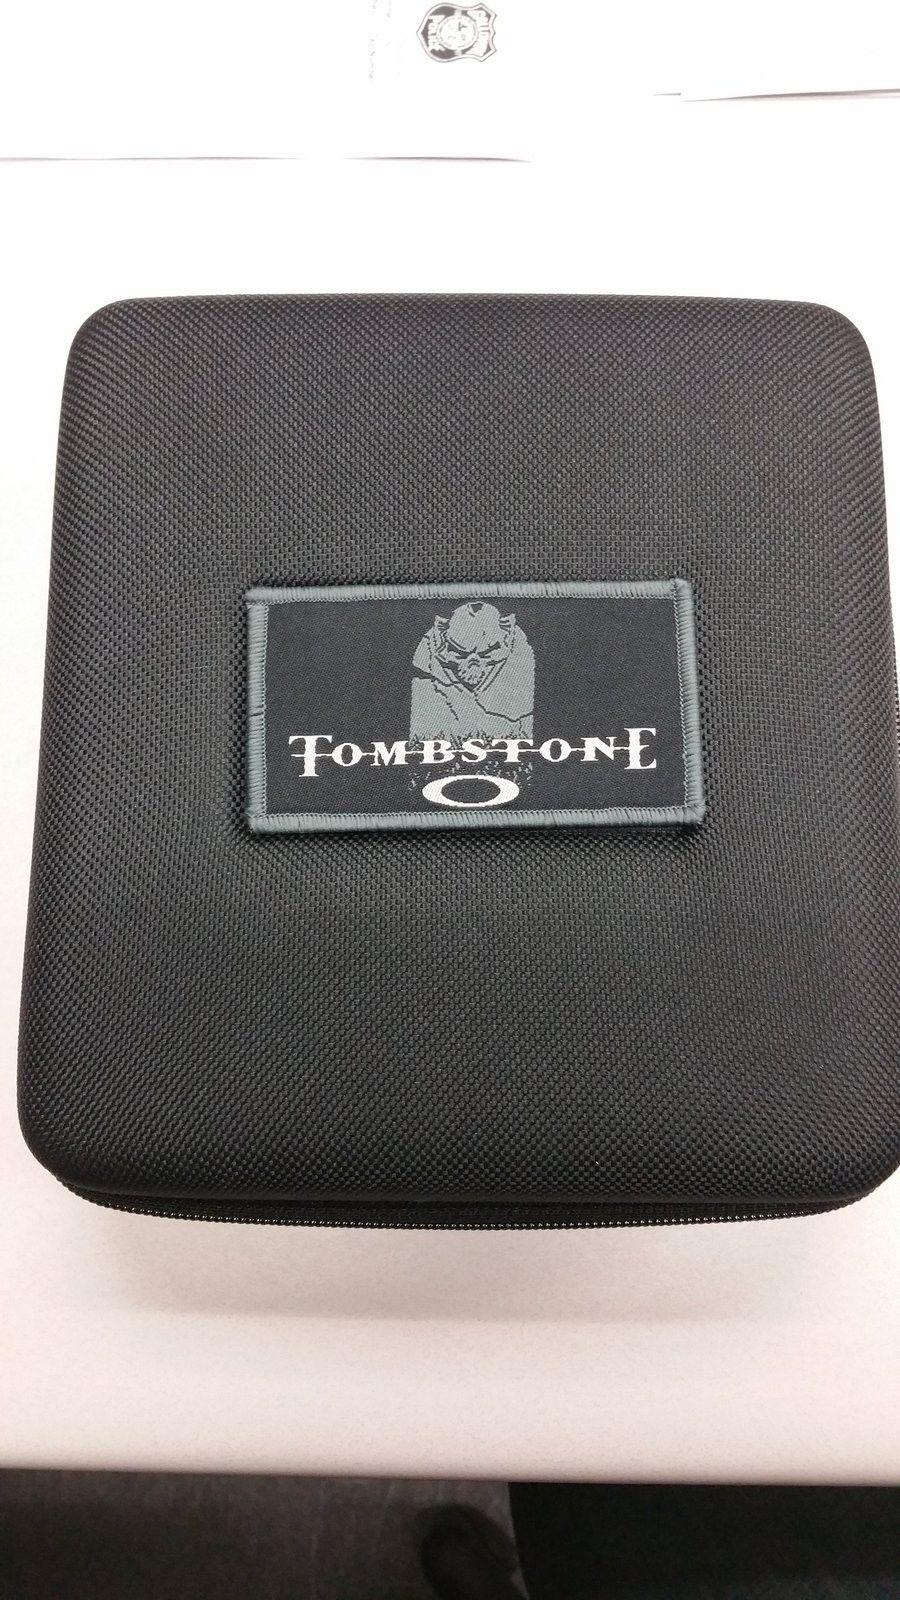 SI Tombstone - uploadfromtaptalk1446599817590.jpg